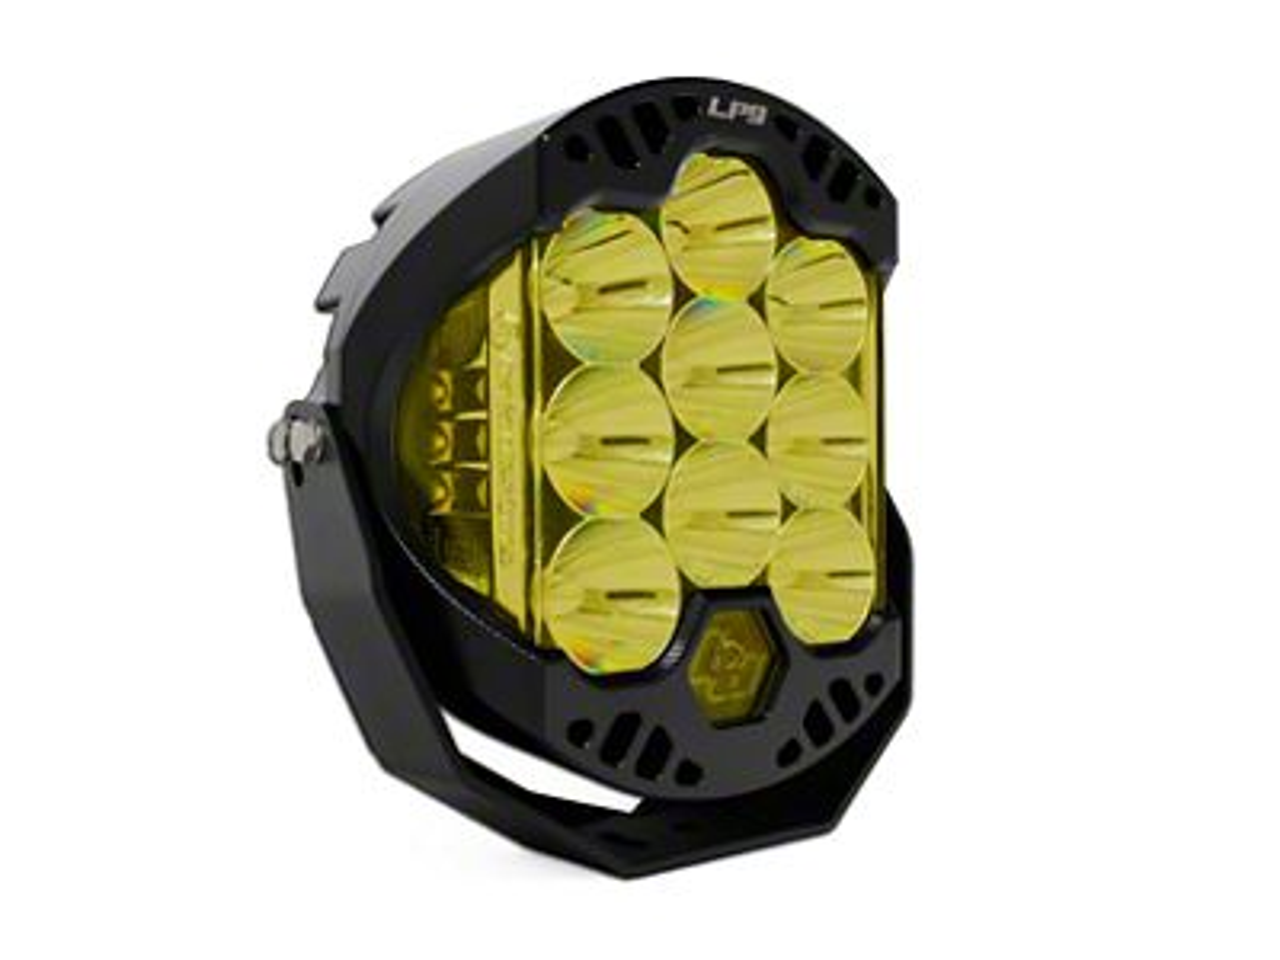 Baja Designs 8 in. LP9 Racer Edition Round Amber LED Light - Spot Beam